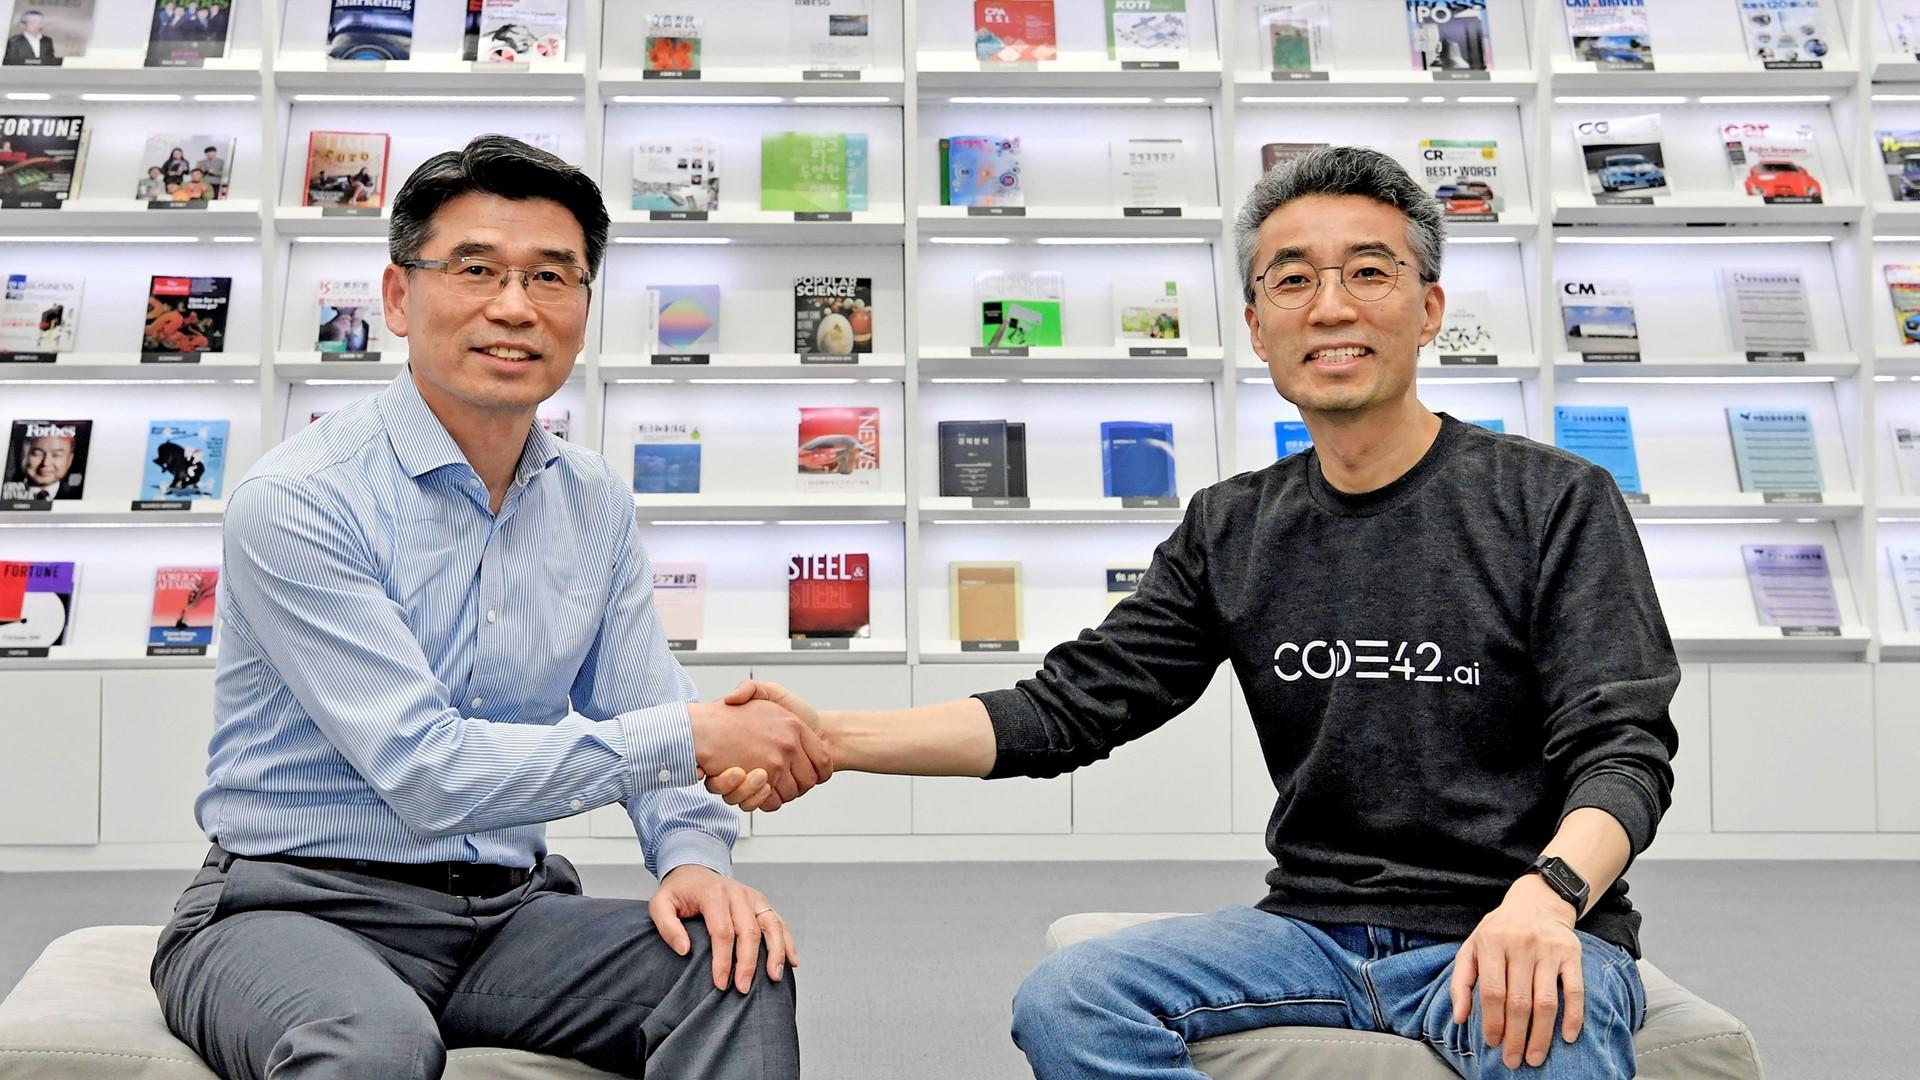 Kia Motors Starts New EV Joint Venture with CODE42.ai